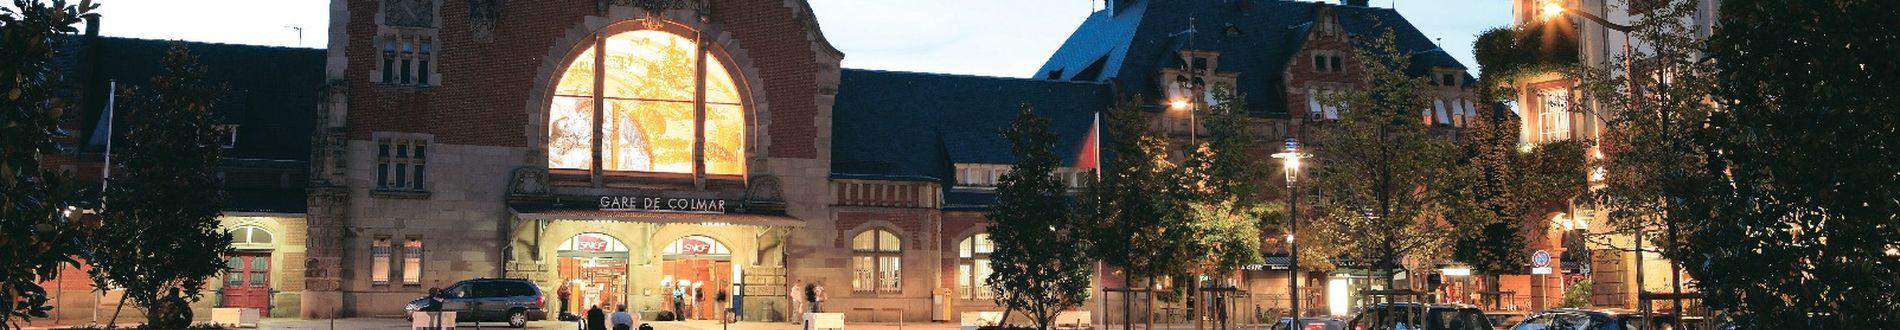 Grand hôtel bristol a Colmar